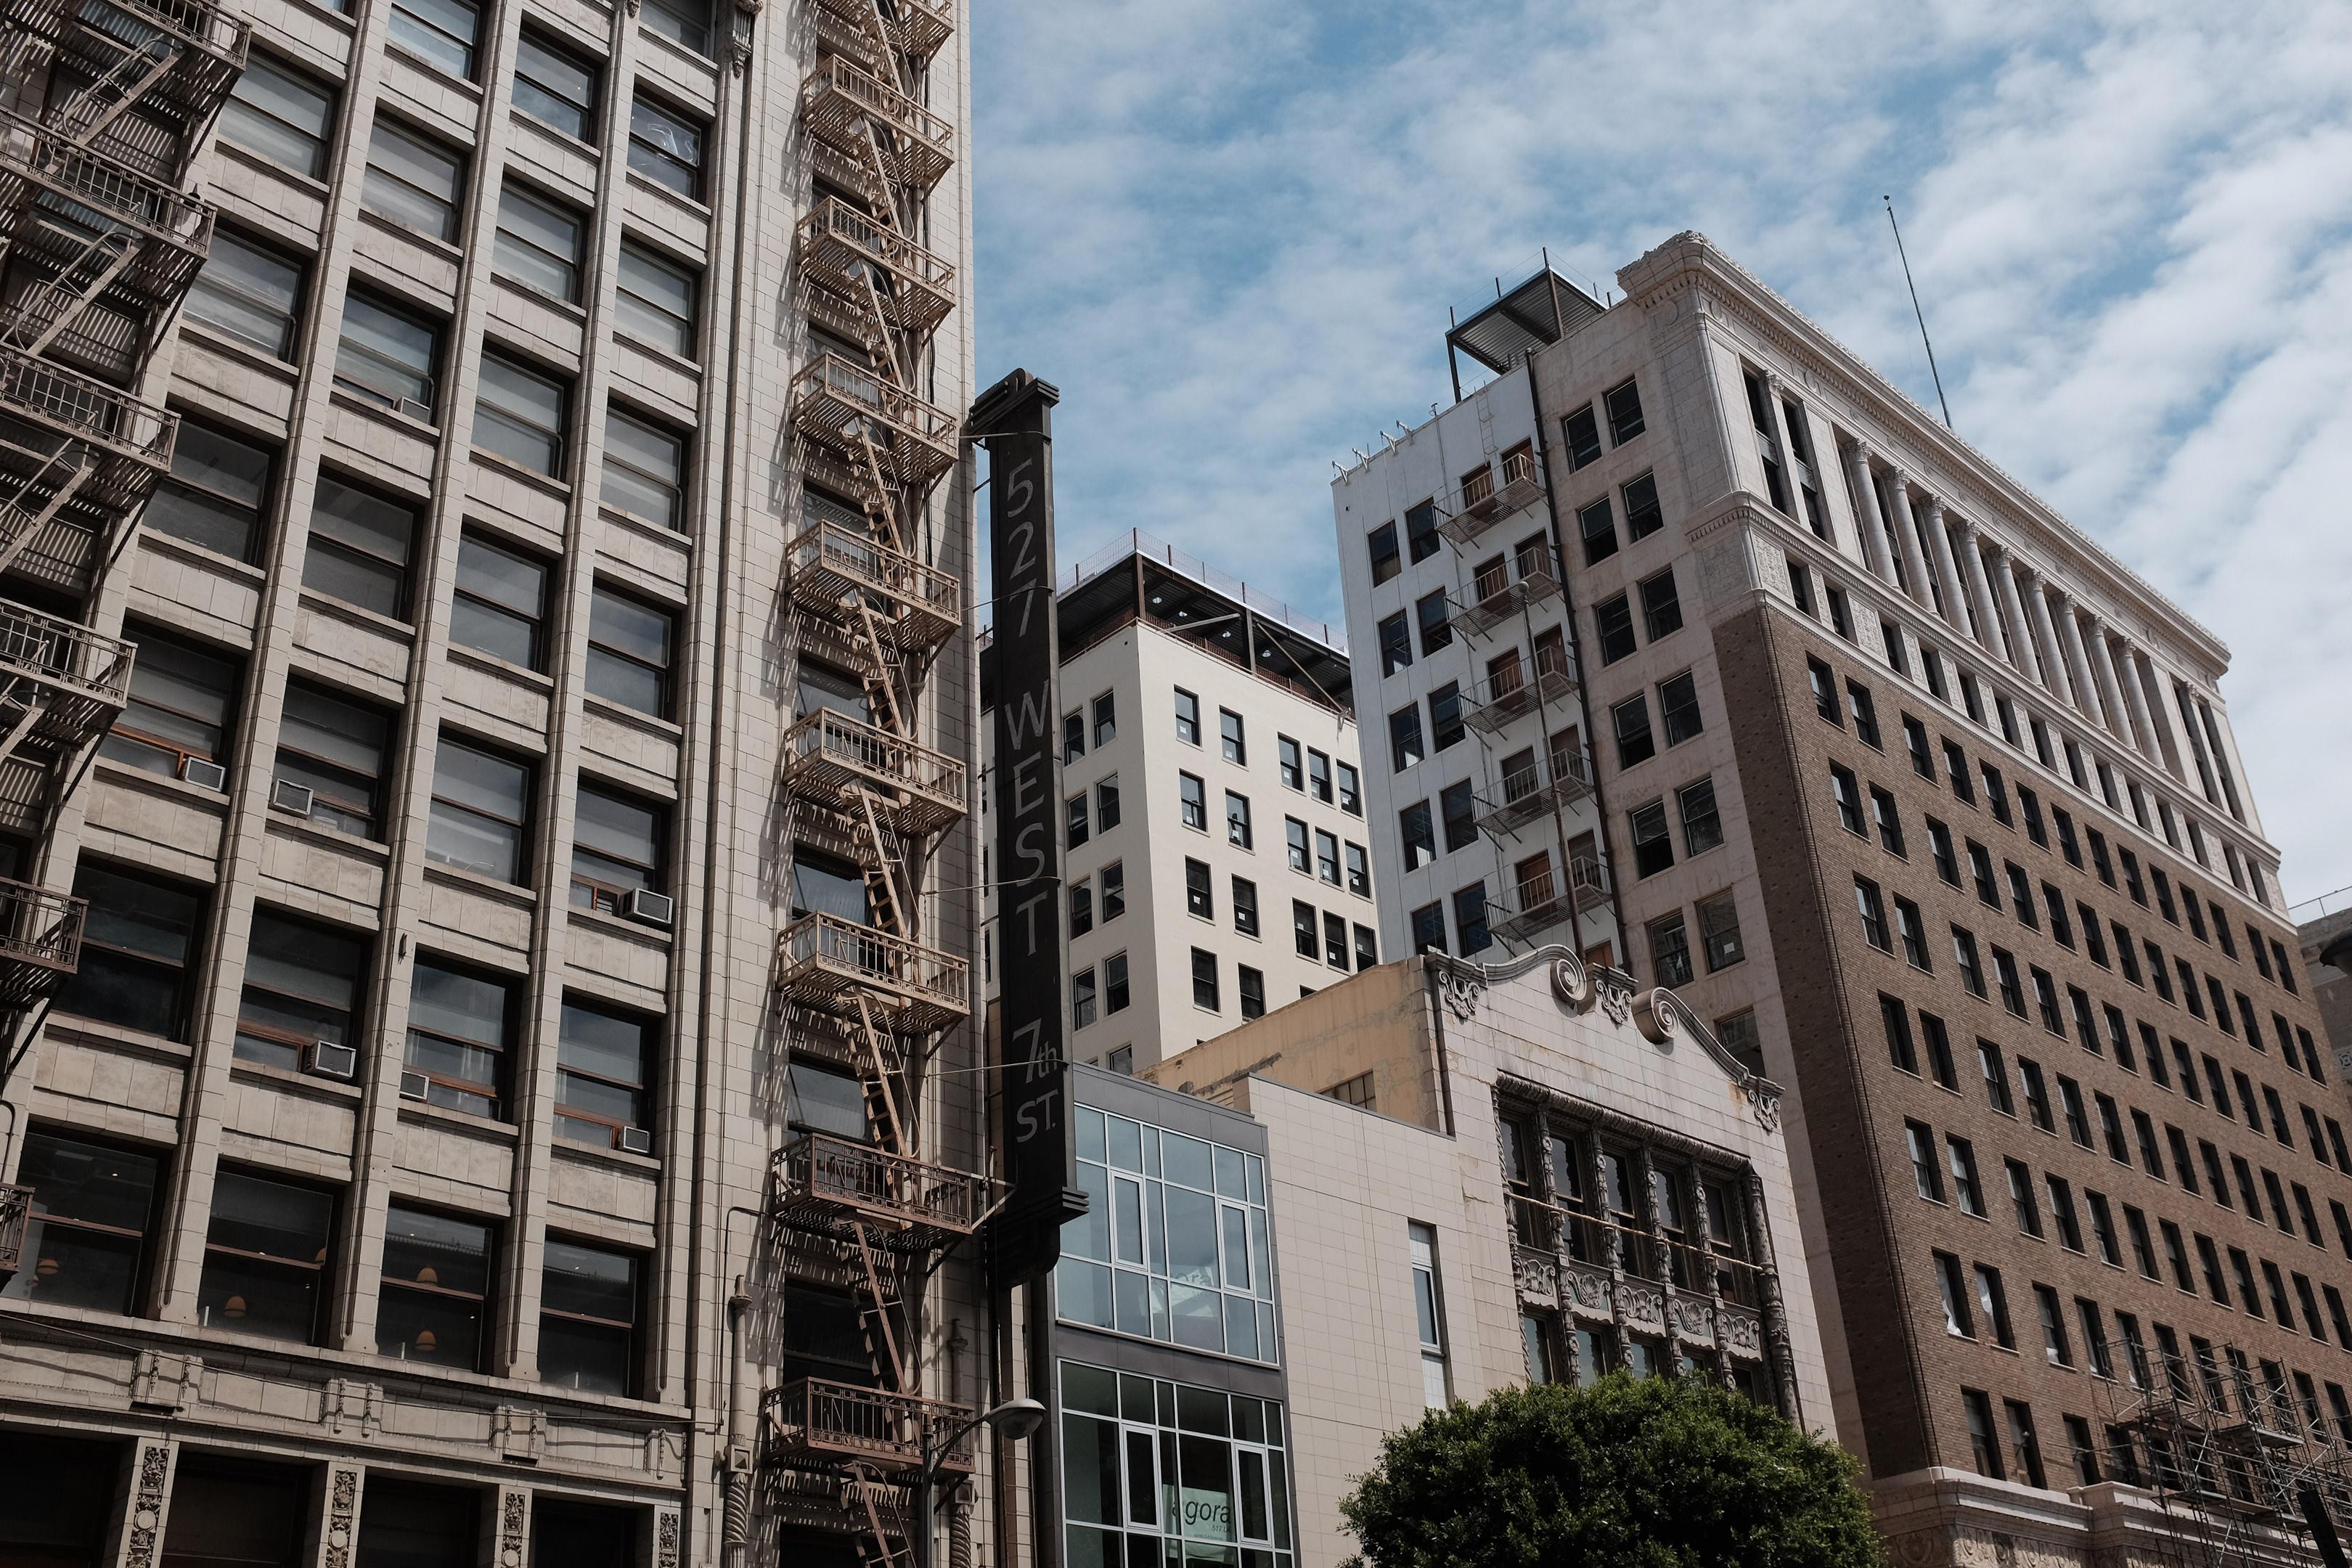 527 West 7th Street in Los Angeles, California.